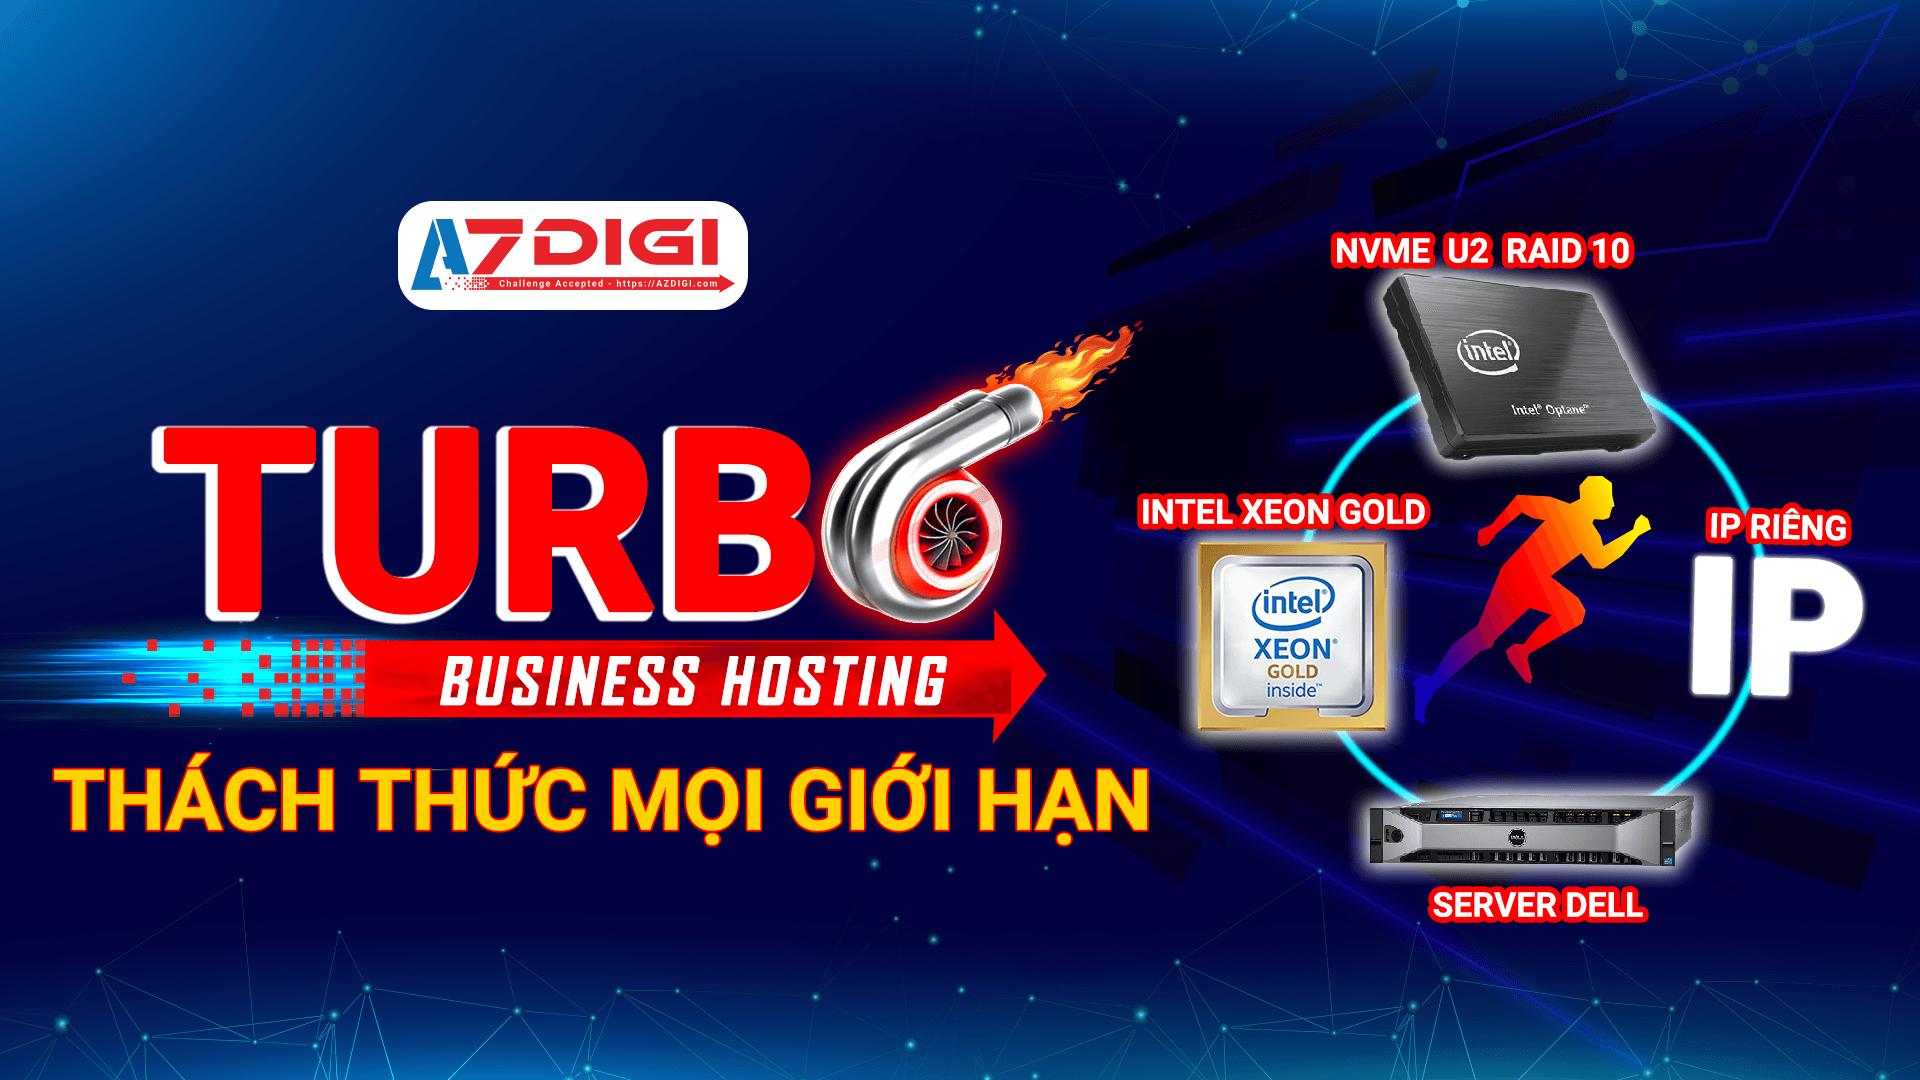 2 Turbo Business Hosting 1920x1080 2 1